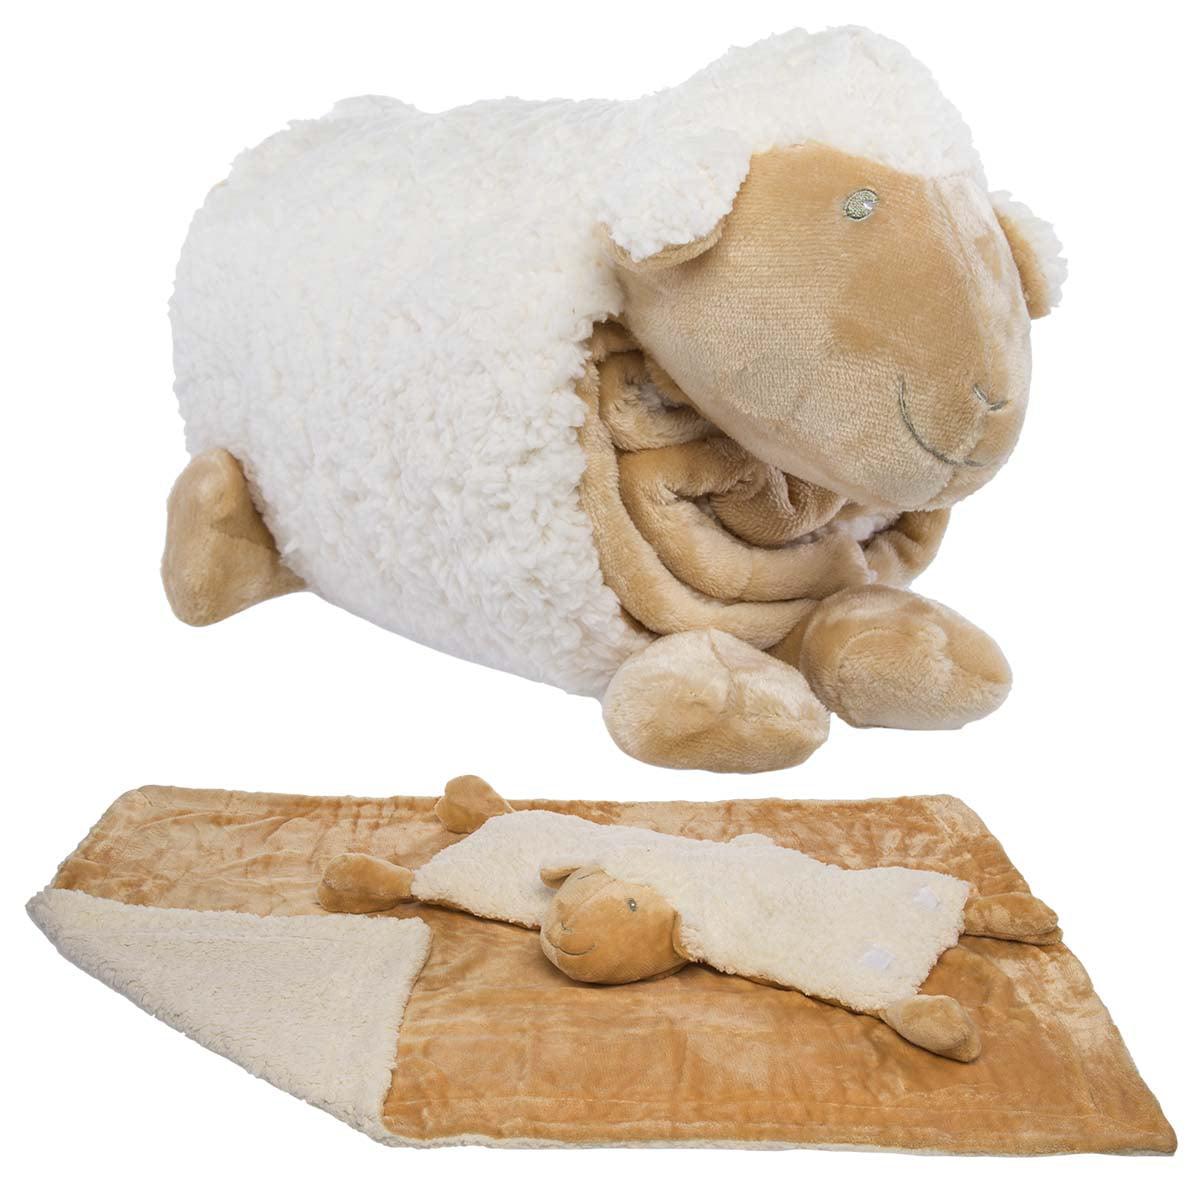 Snuggle Me Sherpa Large Soft Baby Blanket Plush Pillow Stuffed